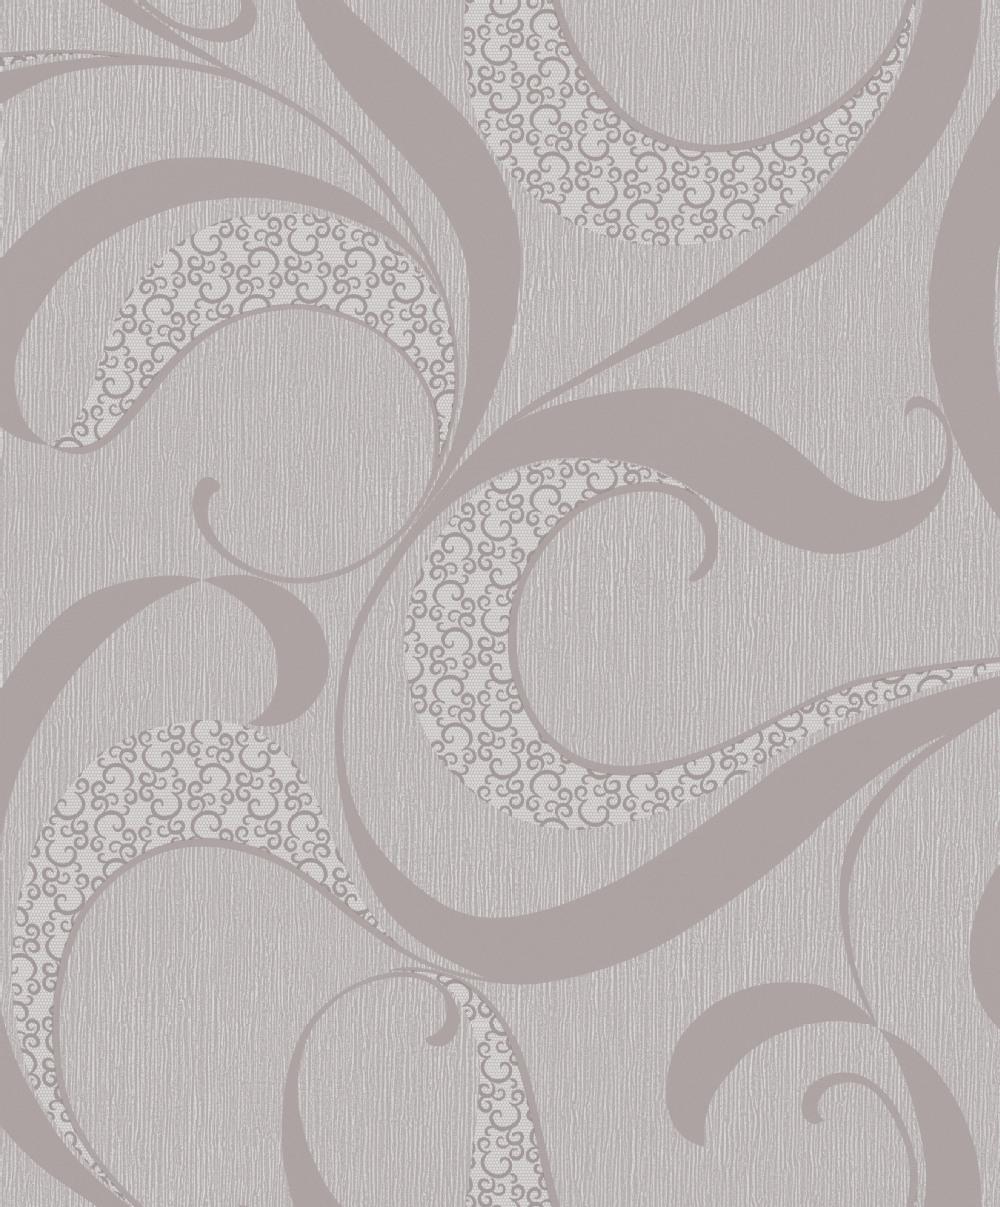 F3086 wasserdicht wandpaneele/vinyl tapeten/modern wand dekoration ...